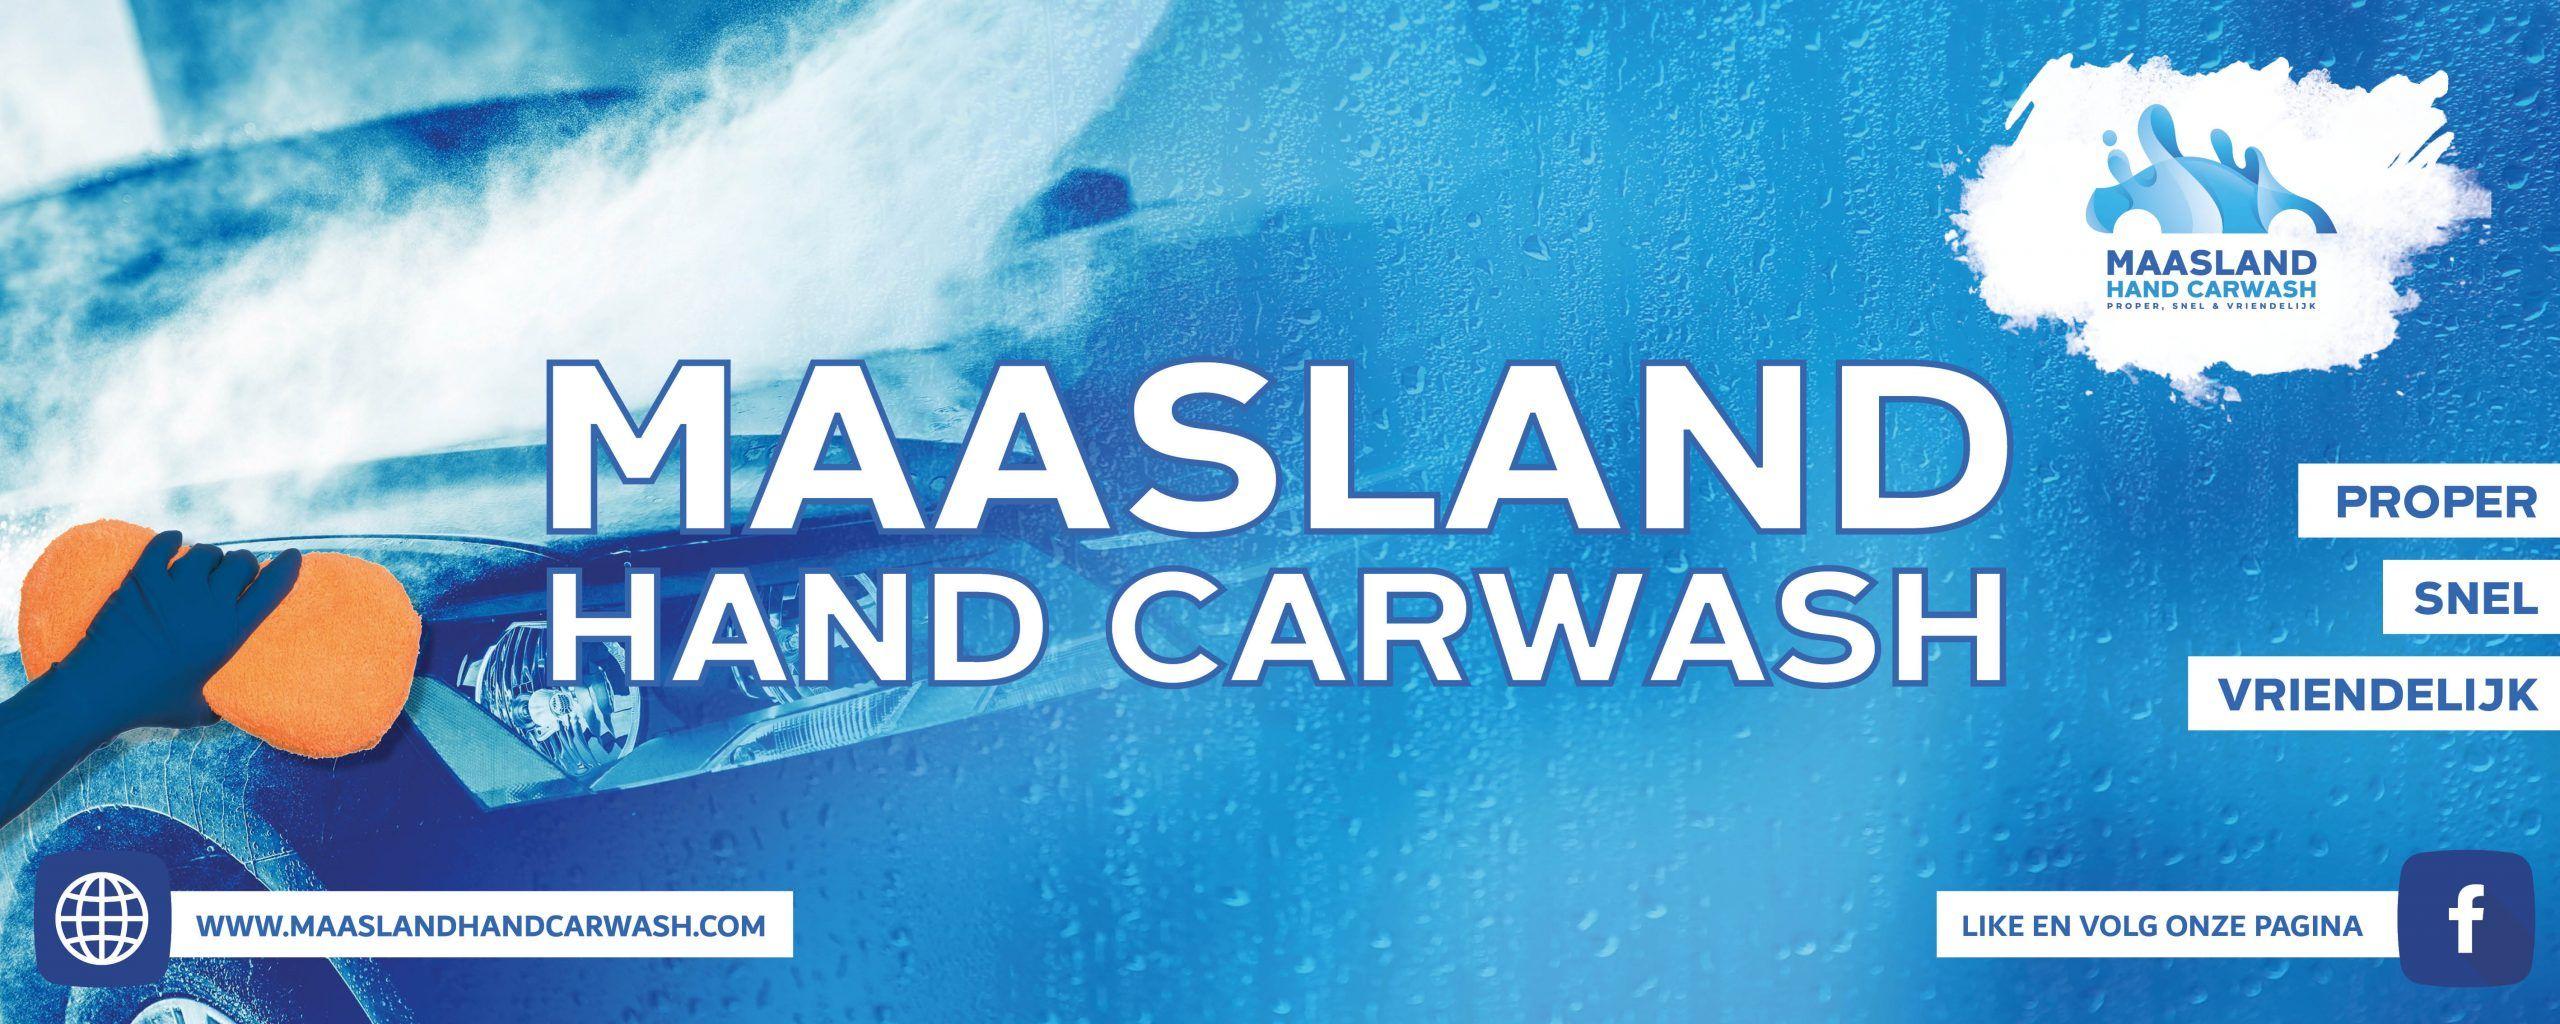 Bovenbord-Carwash